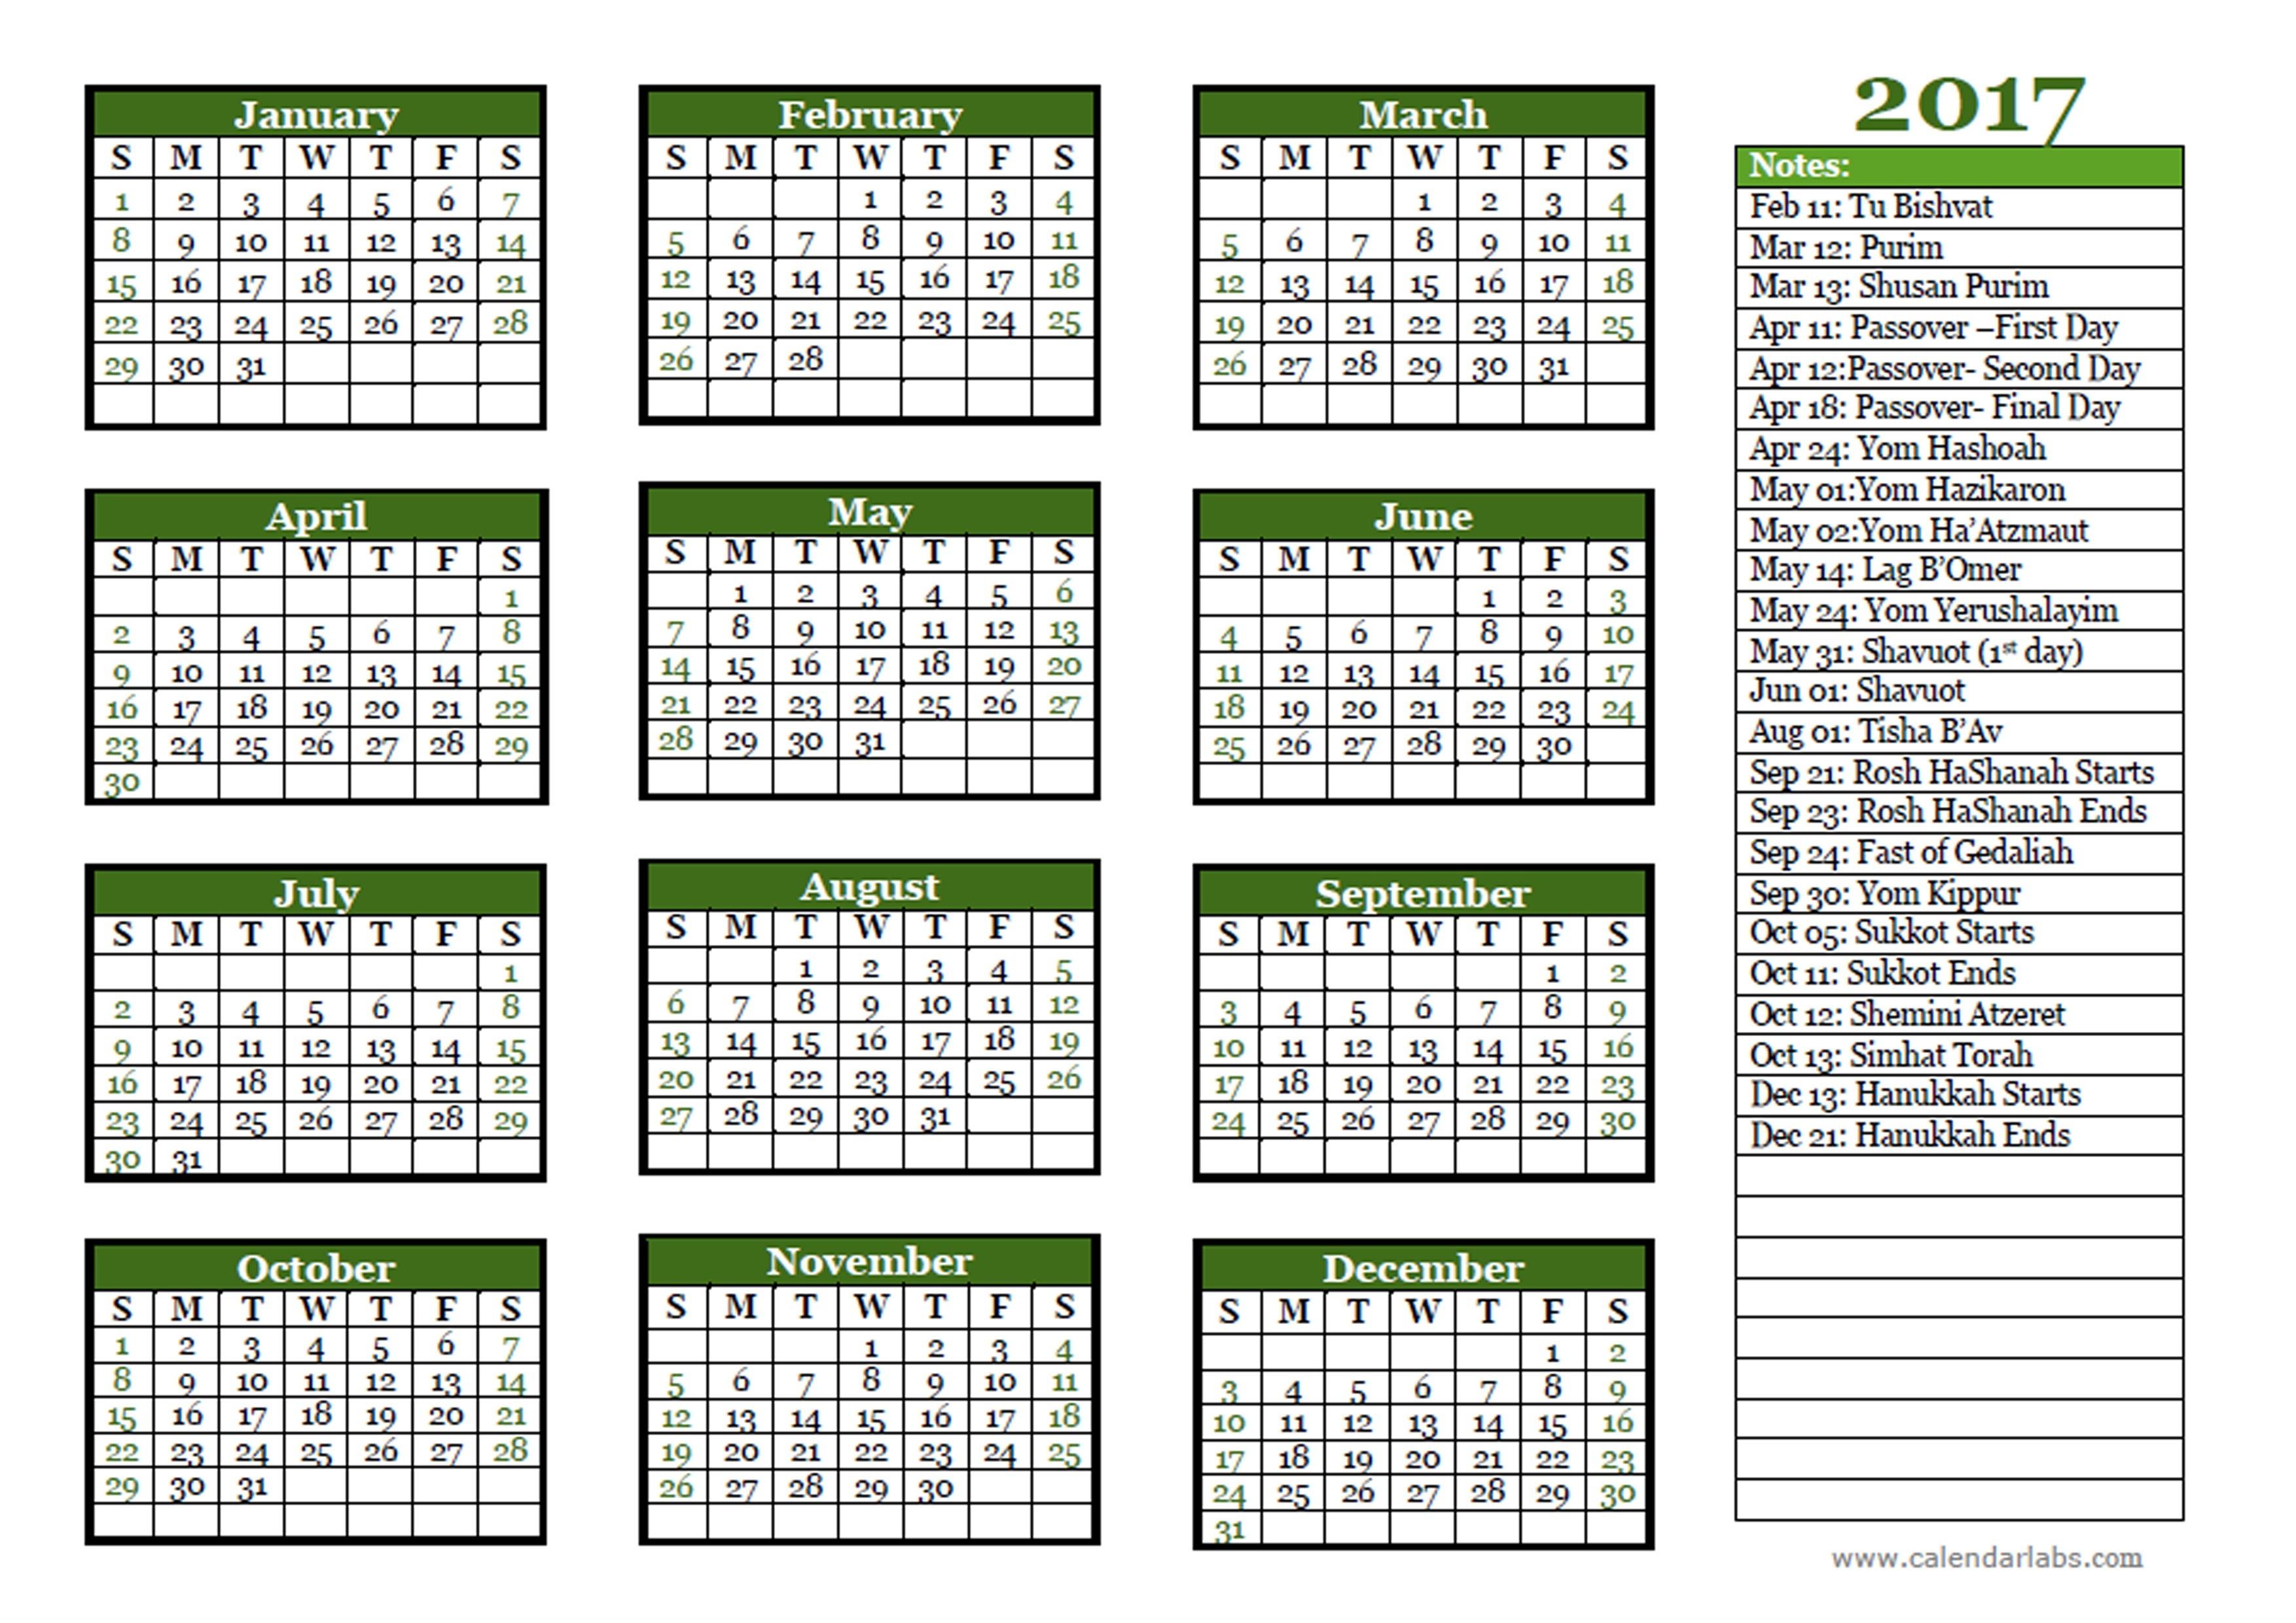 Jewish Holidays Calendar 2018 - Hebrew Calendar Festivals-Dates For The Jewish Holidays In October